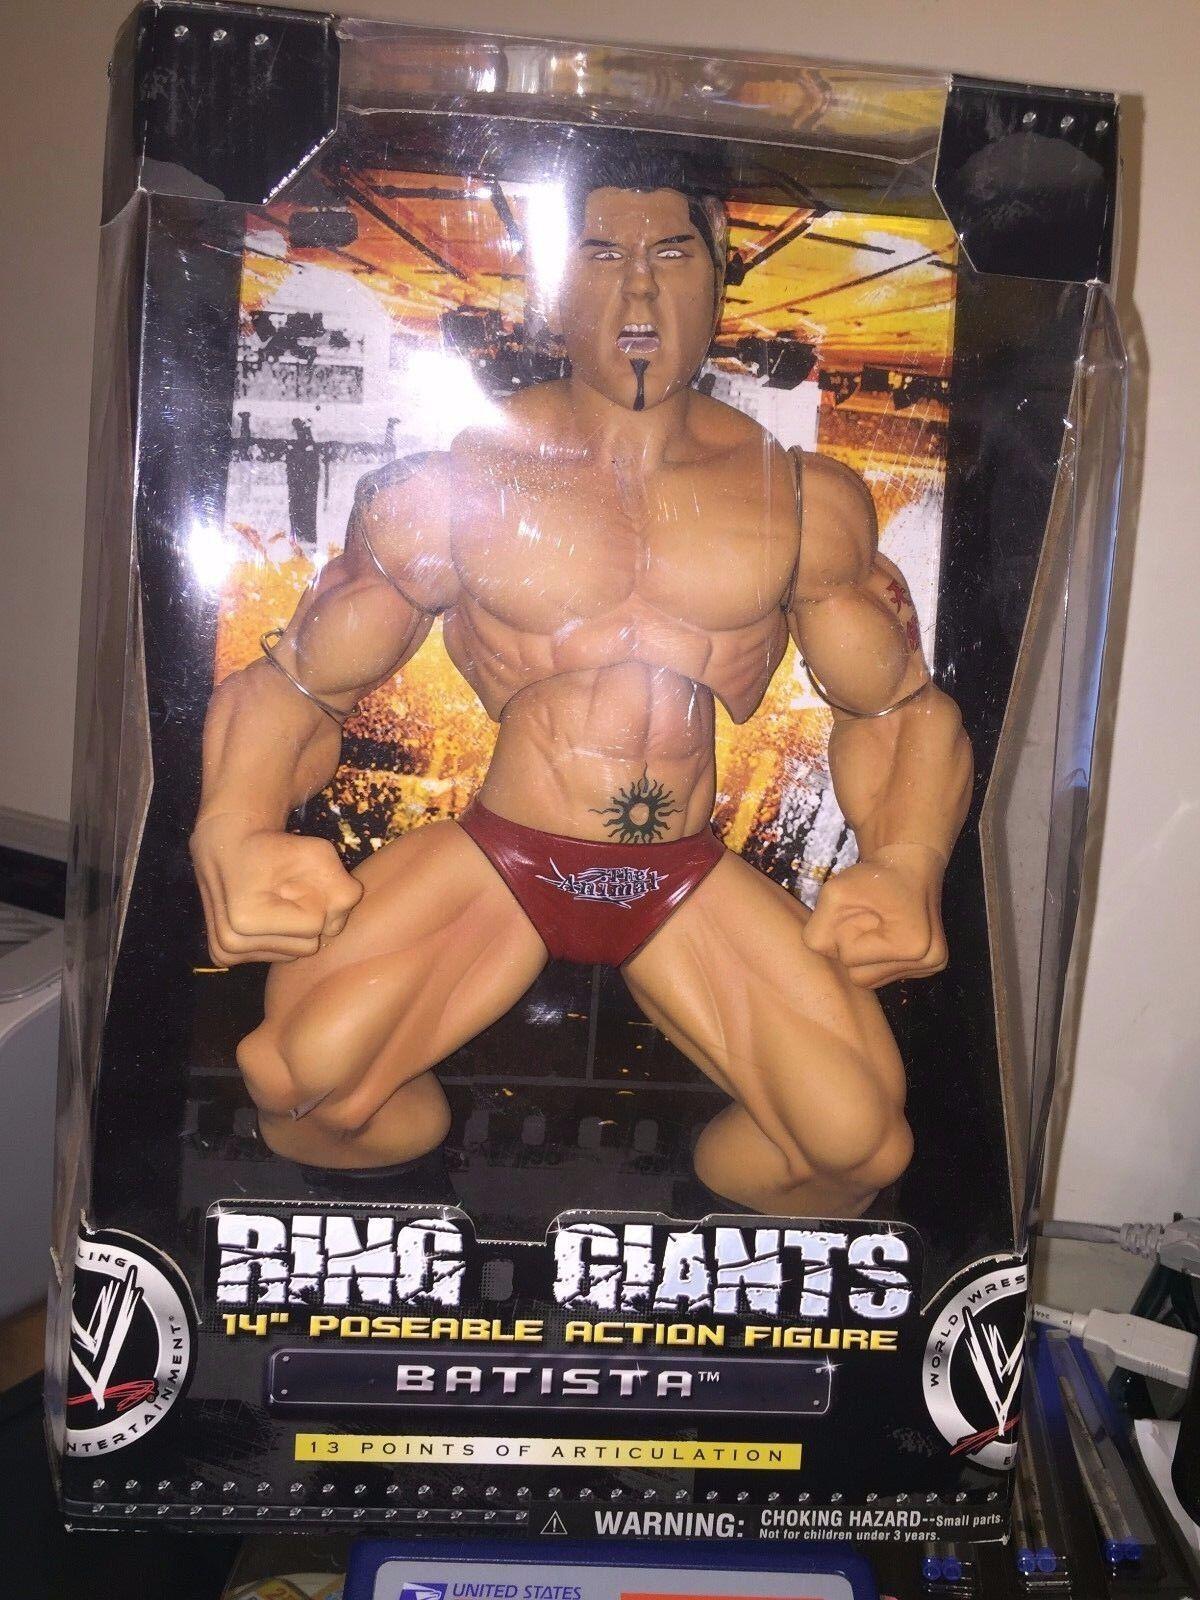 WWE Ring Giants 14  Posable Action Figure Batista NEW